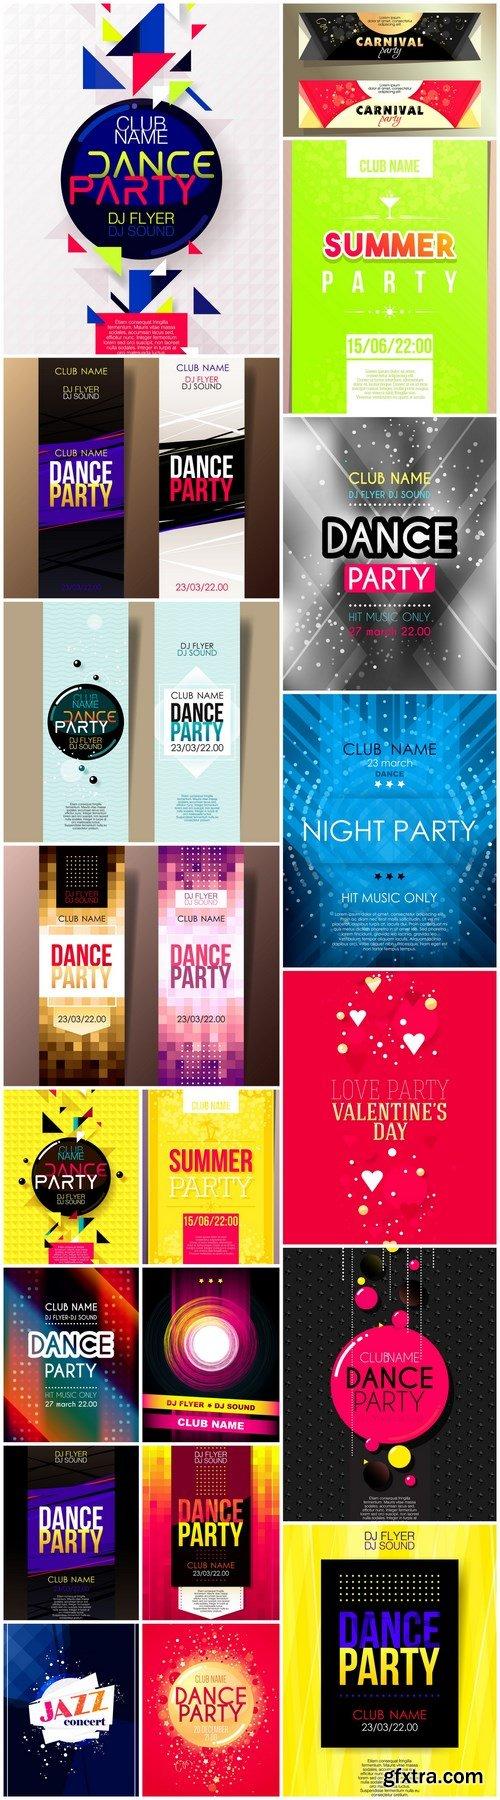 Disco Dance Party Flyer - 20 Vector